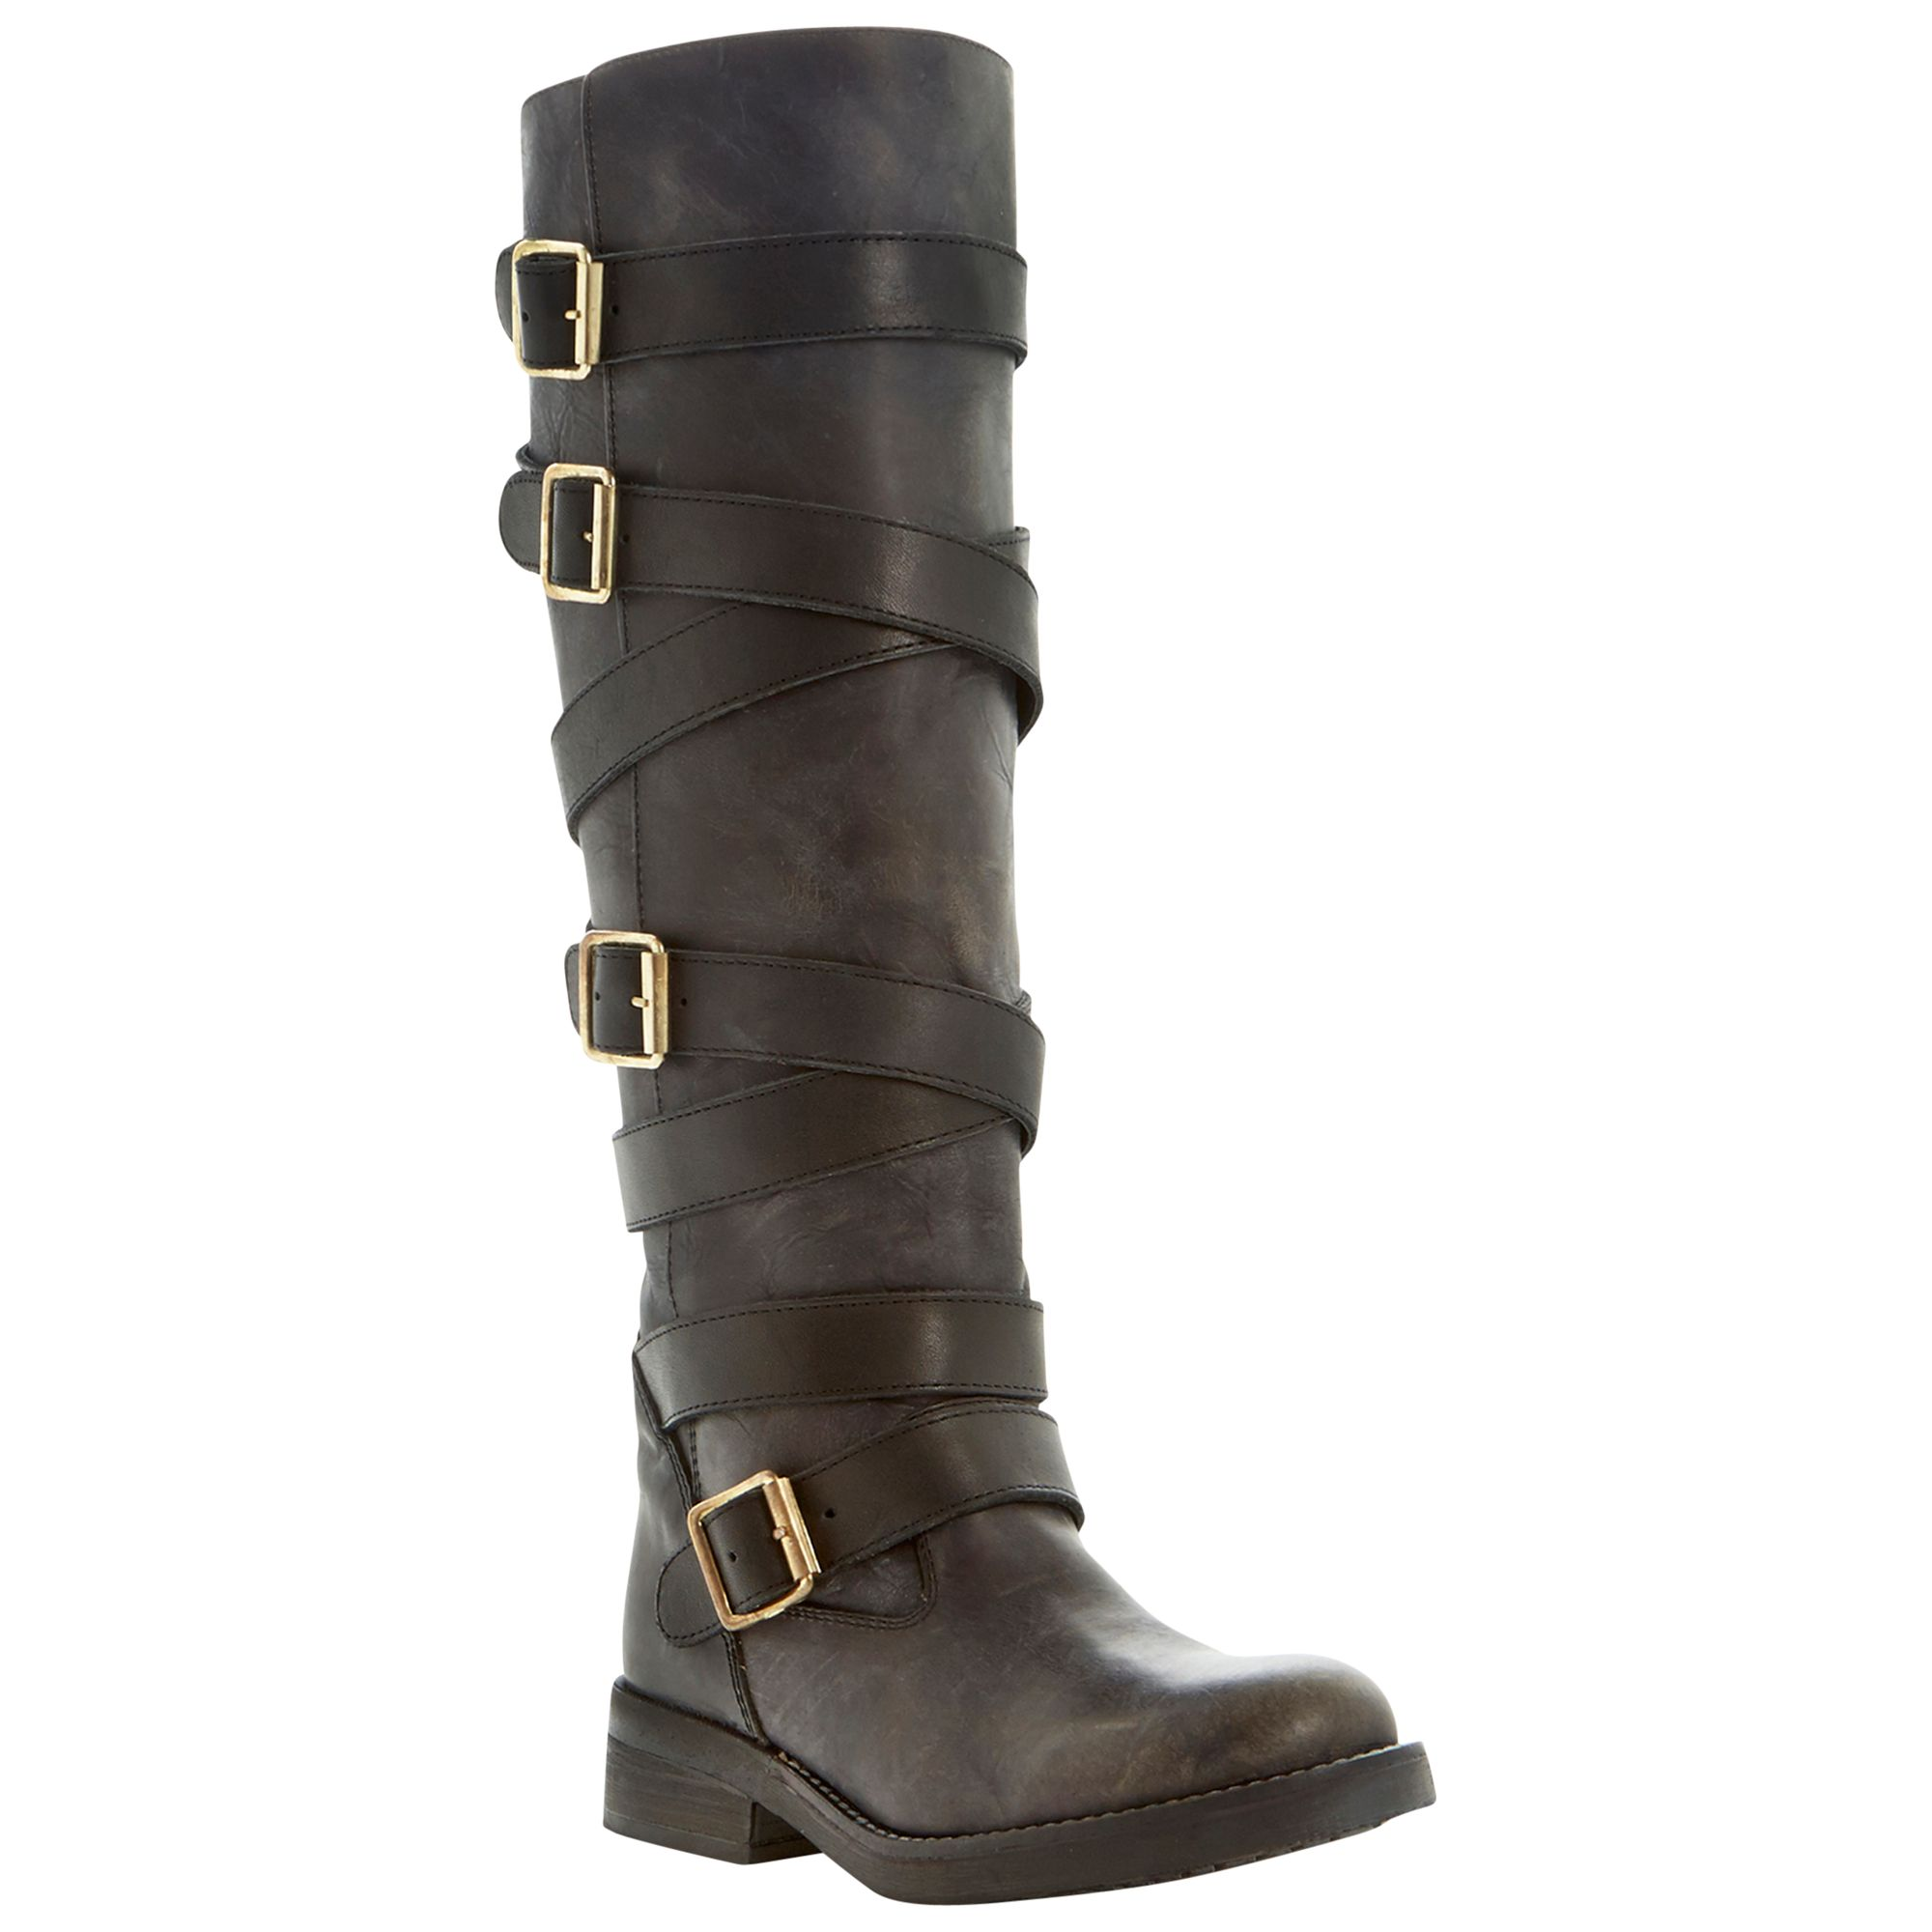 Steve Madden Bryannt Multi-strap Buckle Long Boots, Tan